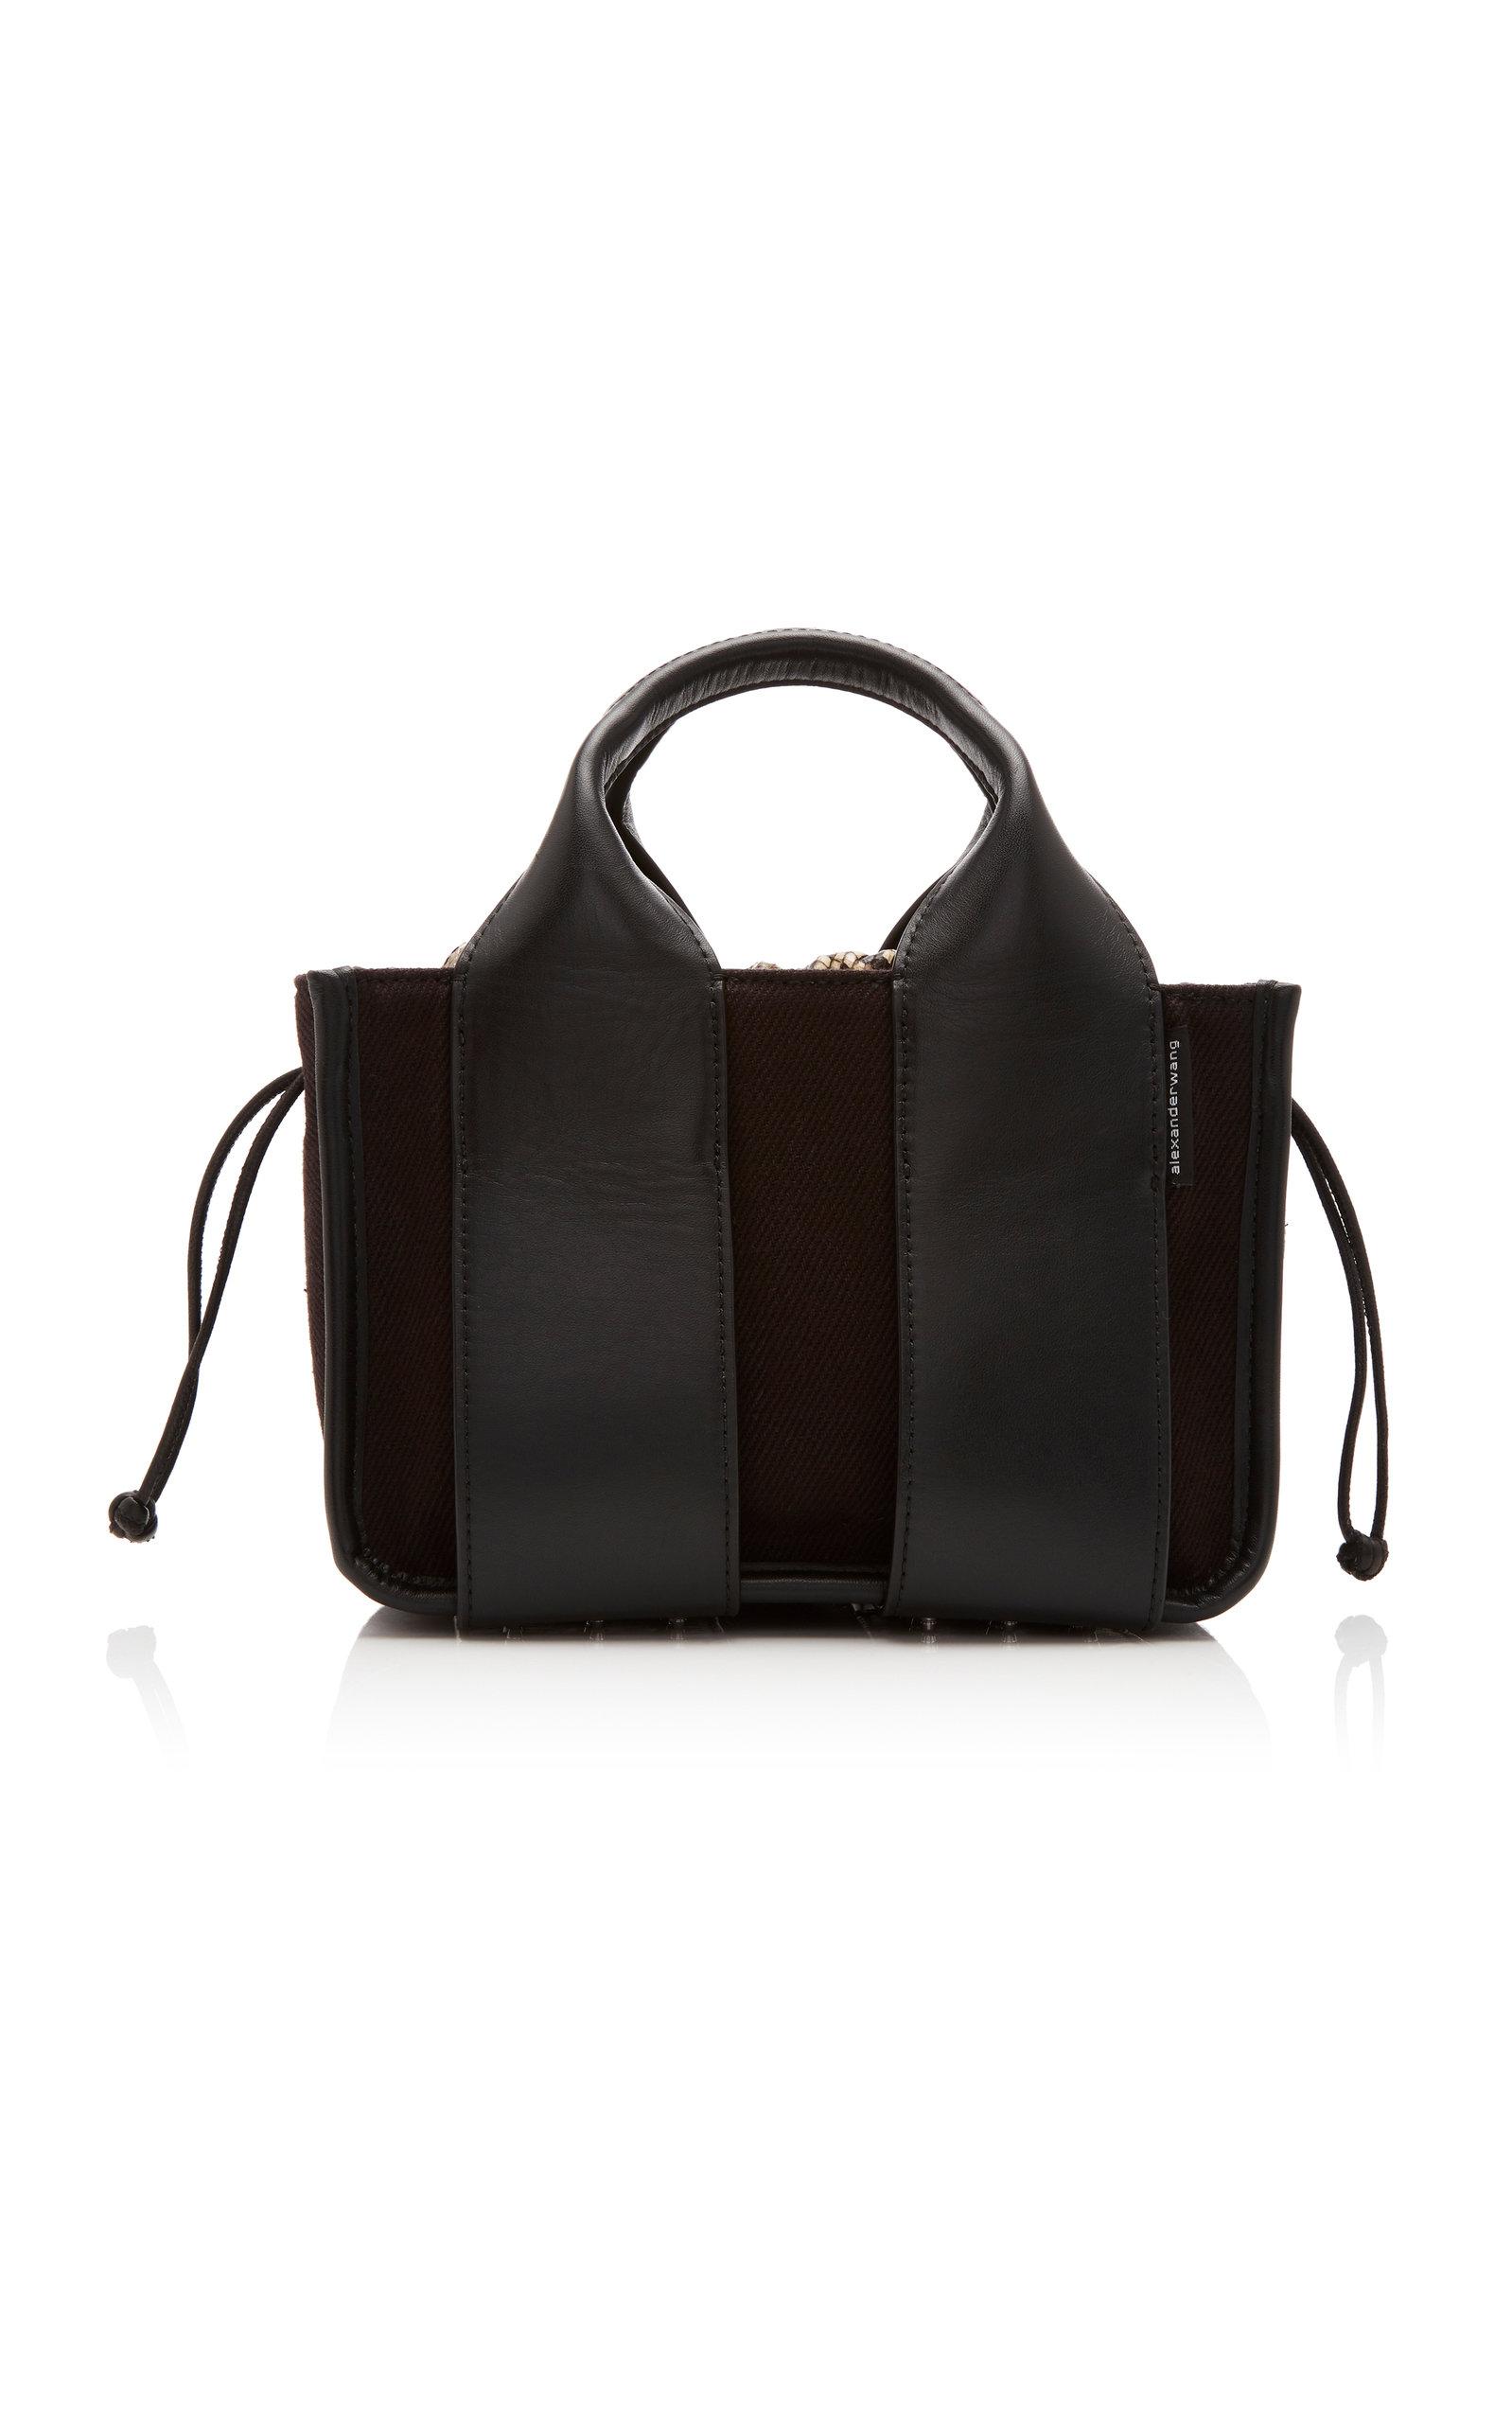 Alexander Wang | Alexander Wang Rocco Leather Drawstring Tote Bag | Clouty